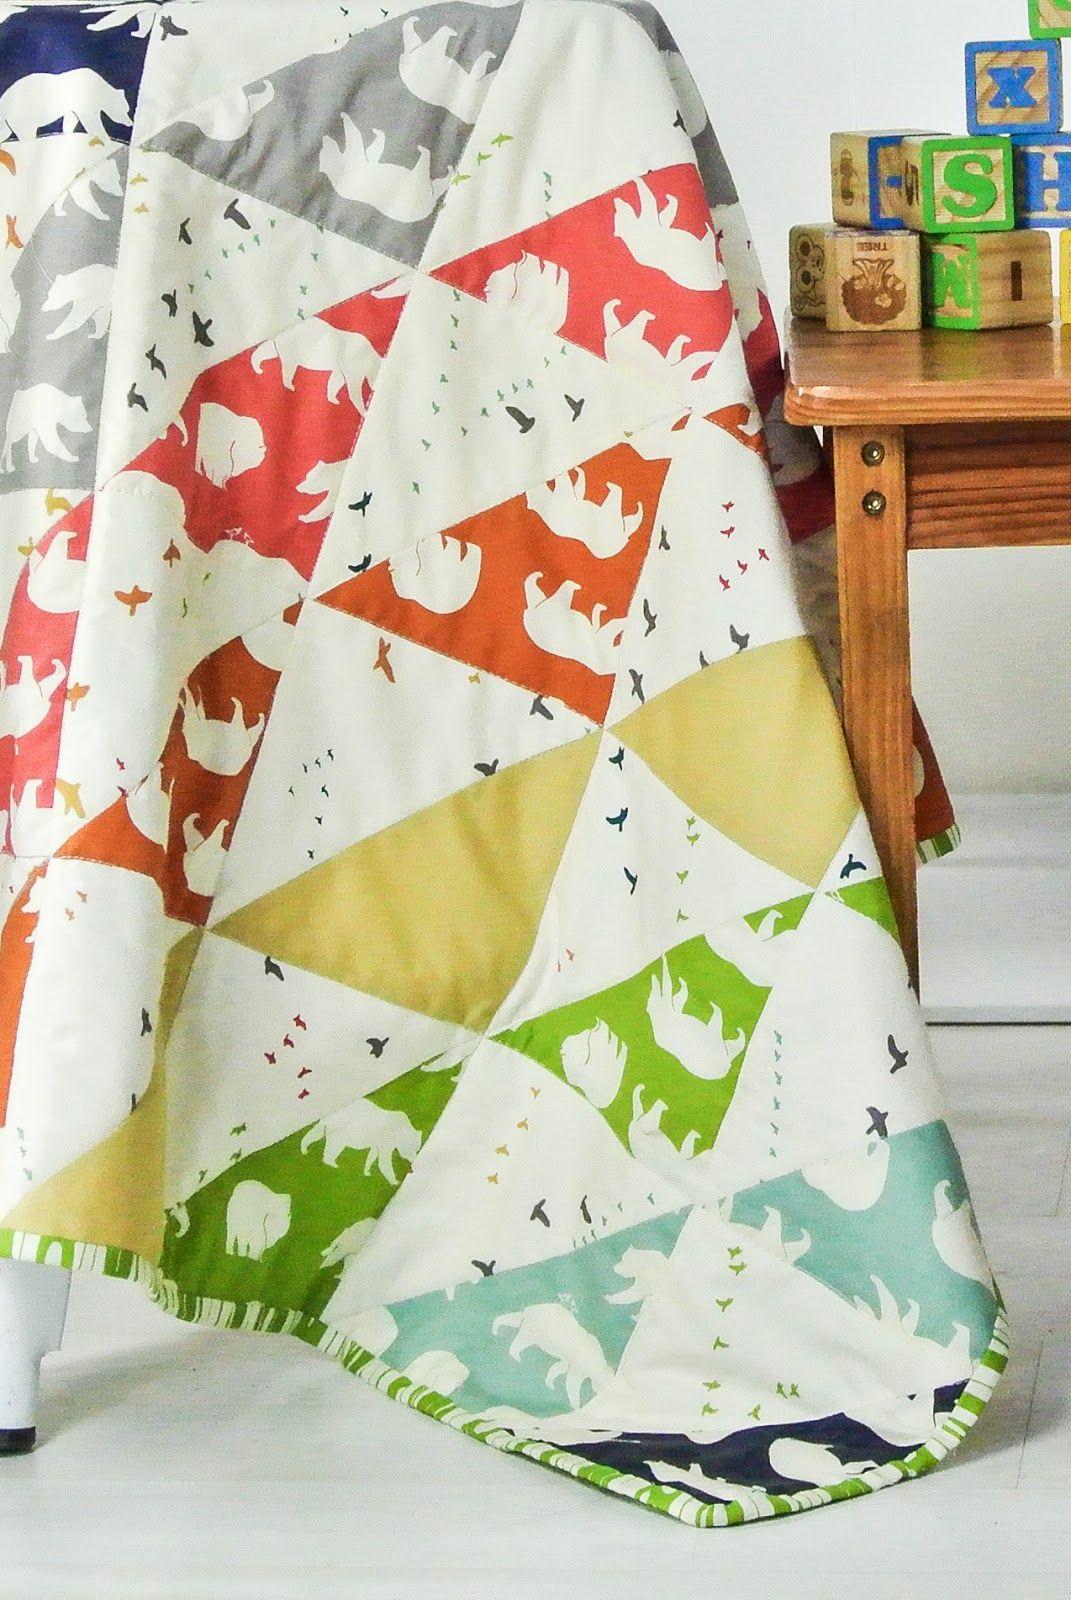 birchfabrics: Free Pattern + A Giveaway | The Bear Necessities Quilt